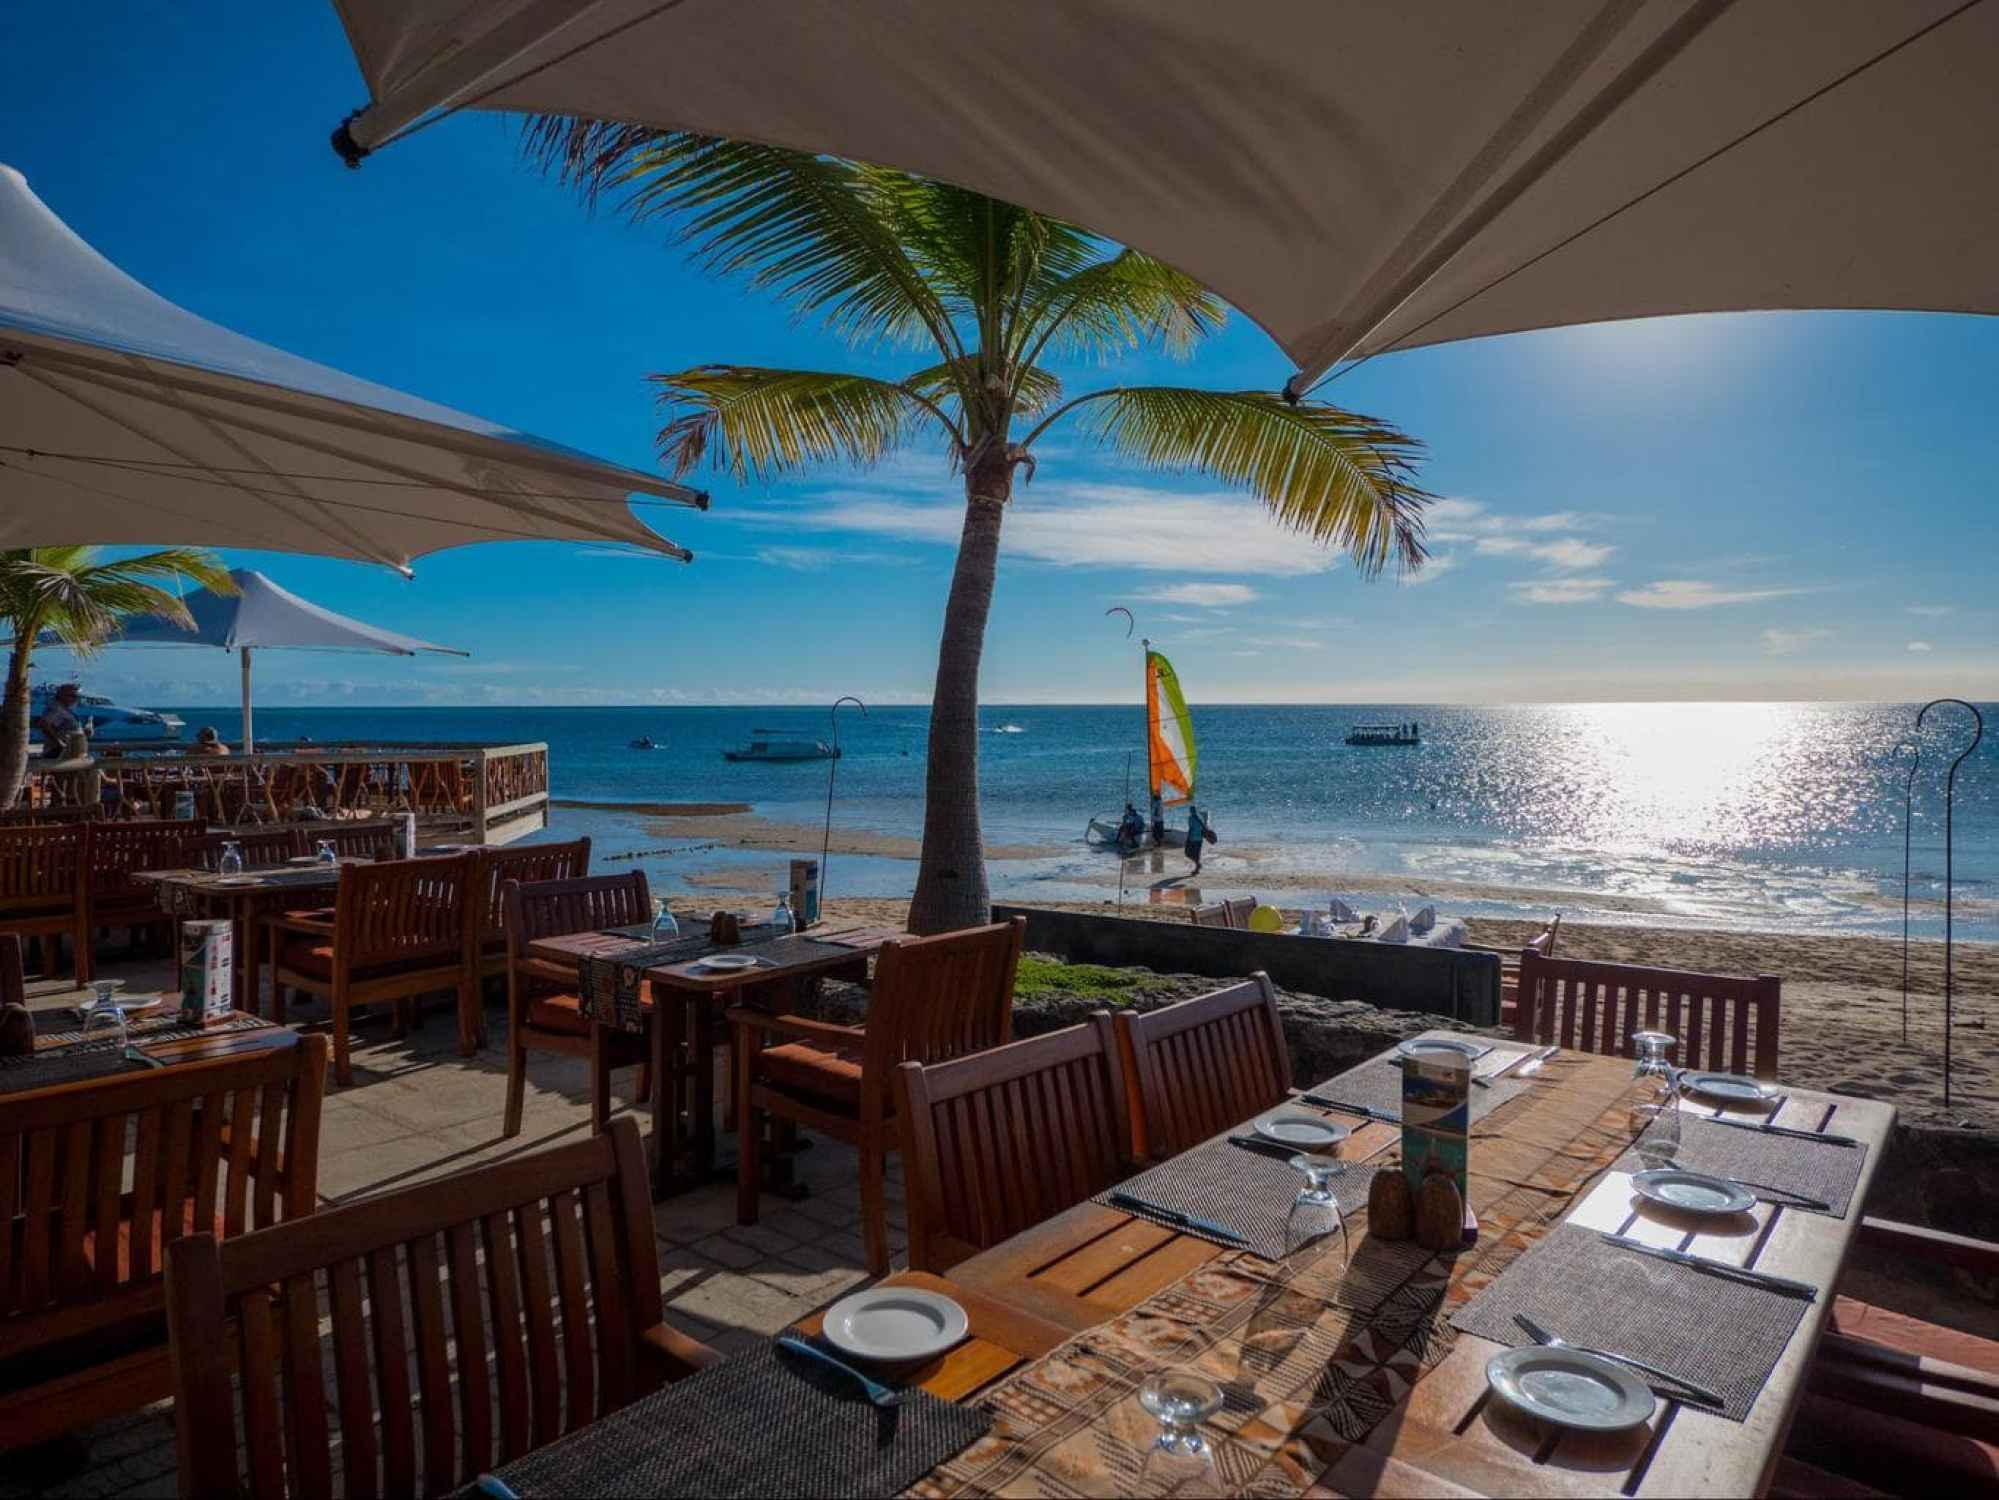 Water's Edge restaurant at sunset